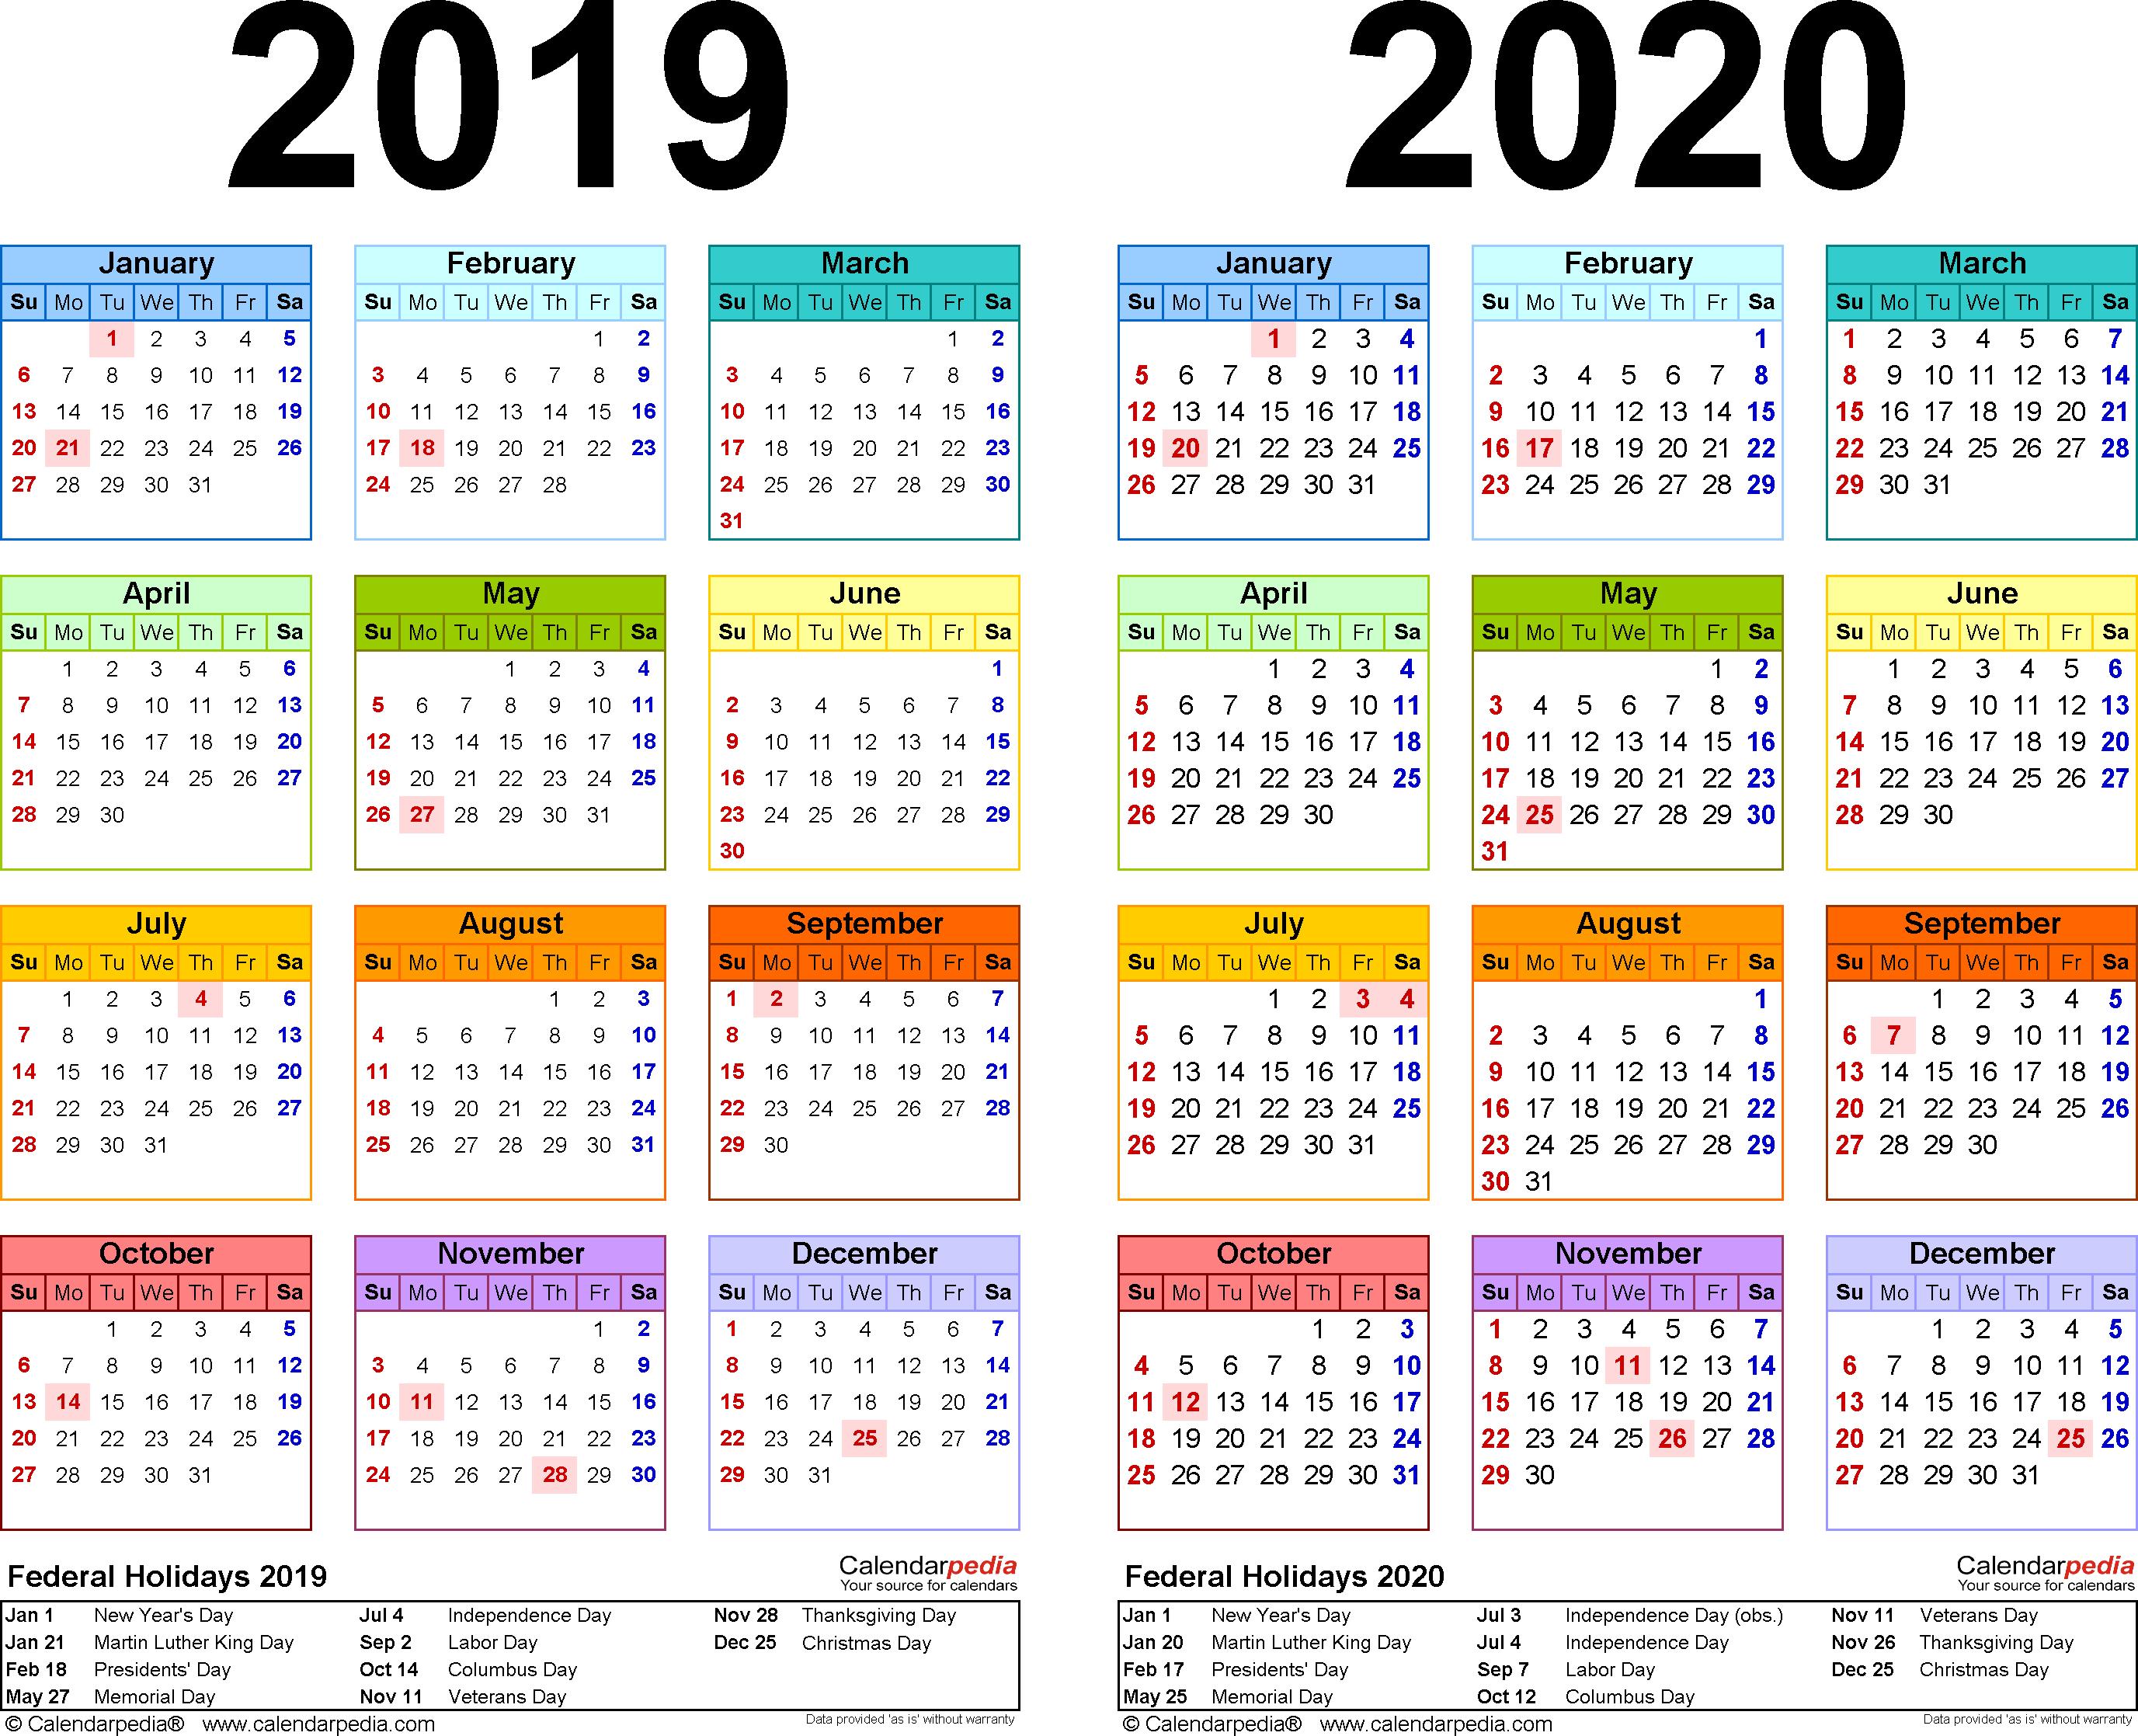 2019-2020 Calendar - Free Printable Two-Year Pdf Calendars regarding Printable Year At A Glance Calendar 2019-2020